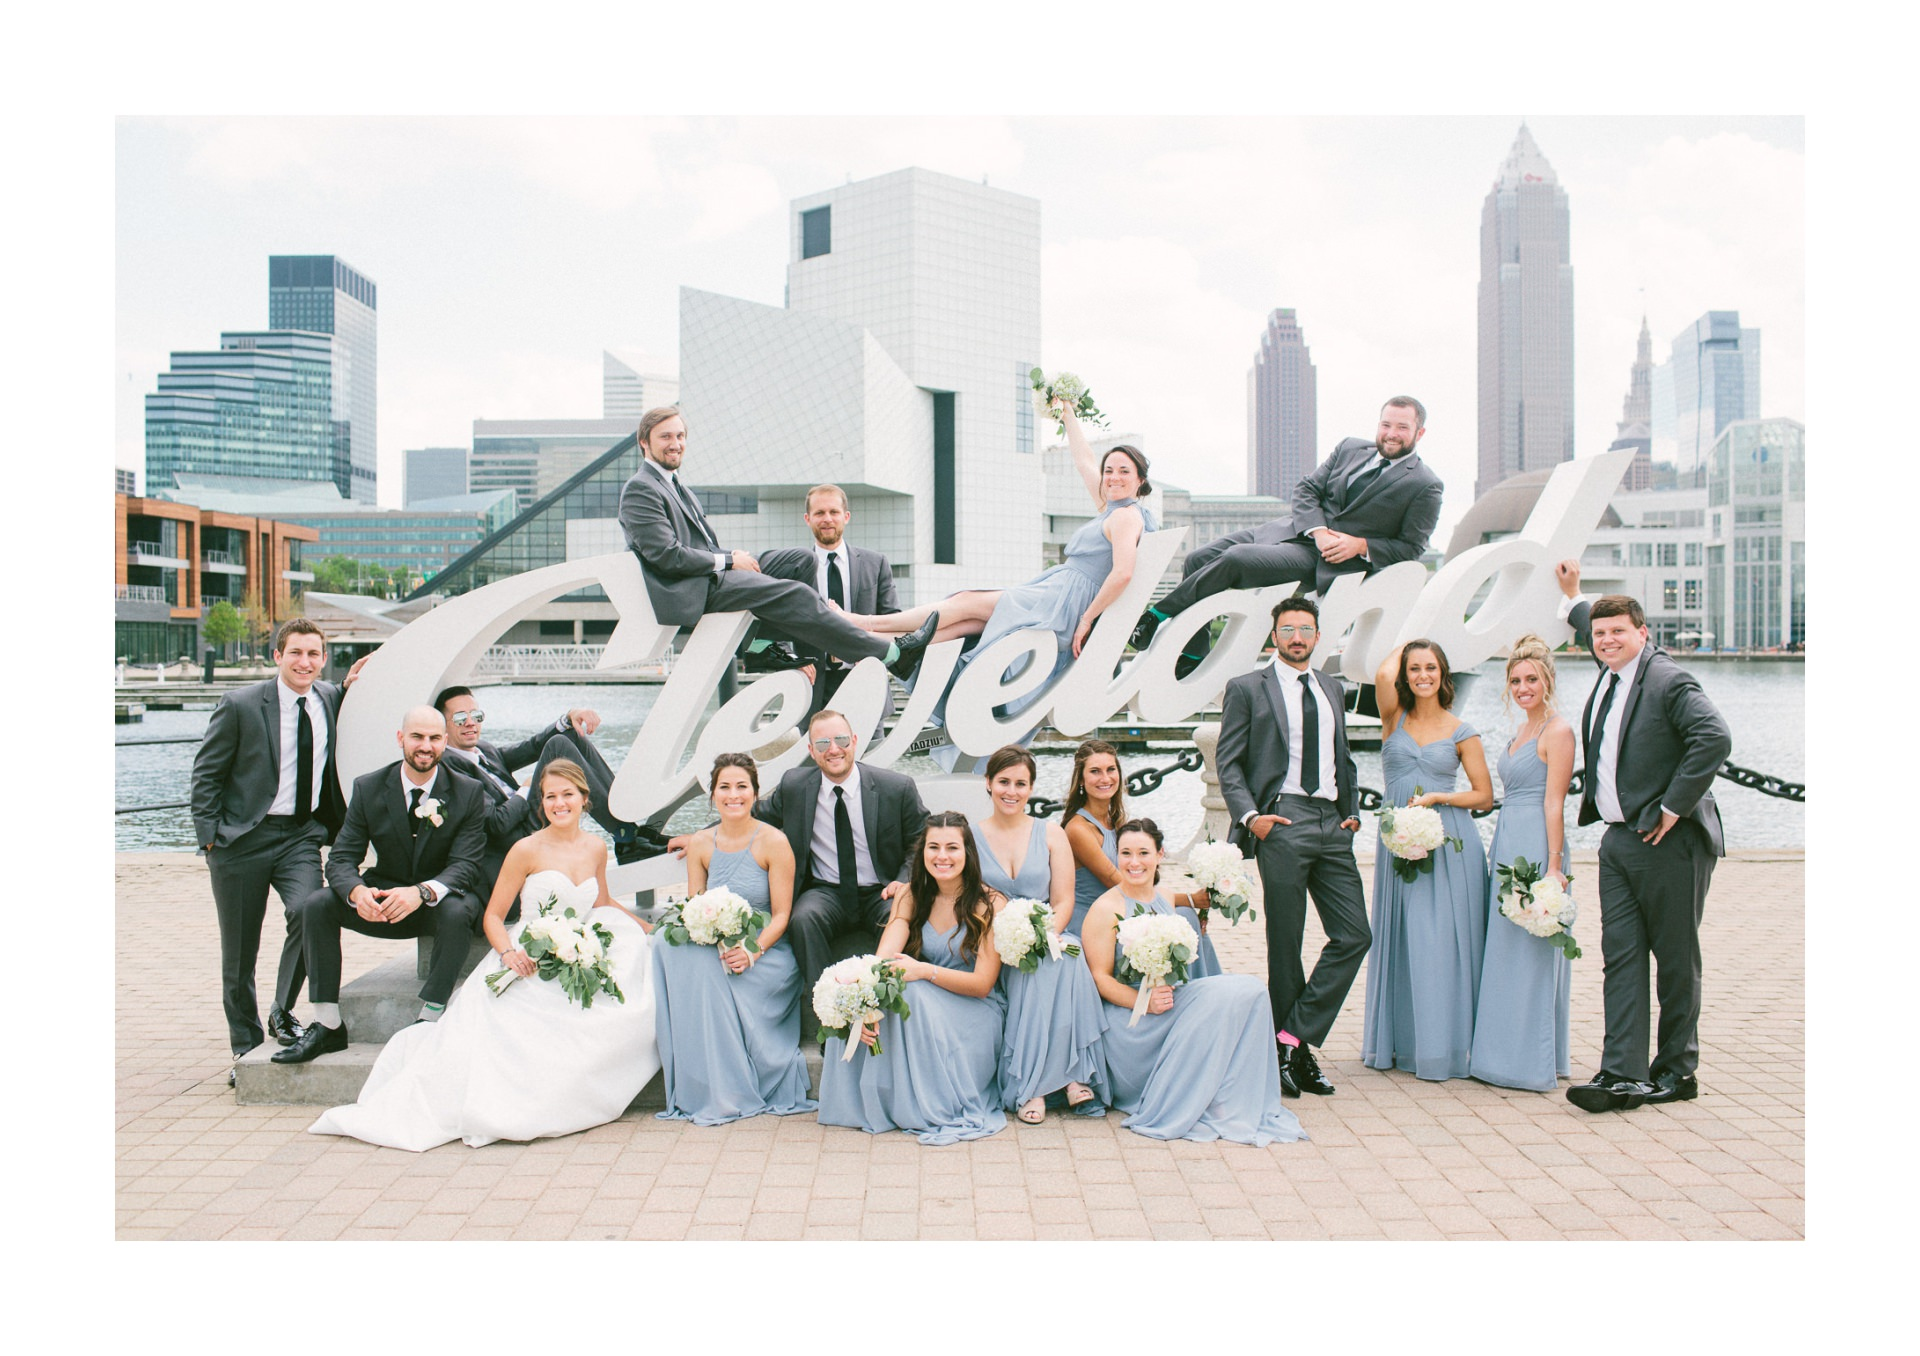 Dowtown Hilton Cleveland Wedding Photographer 1 47.jpg